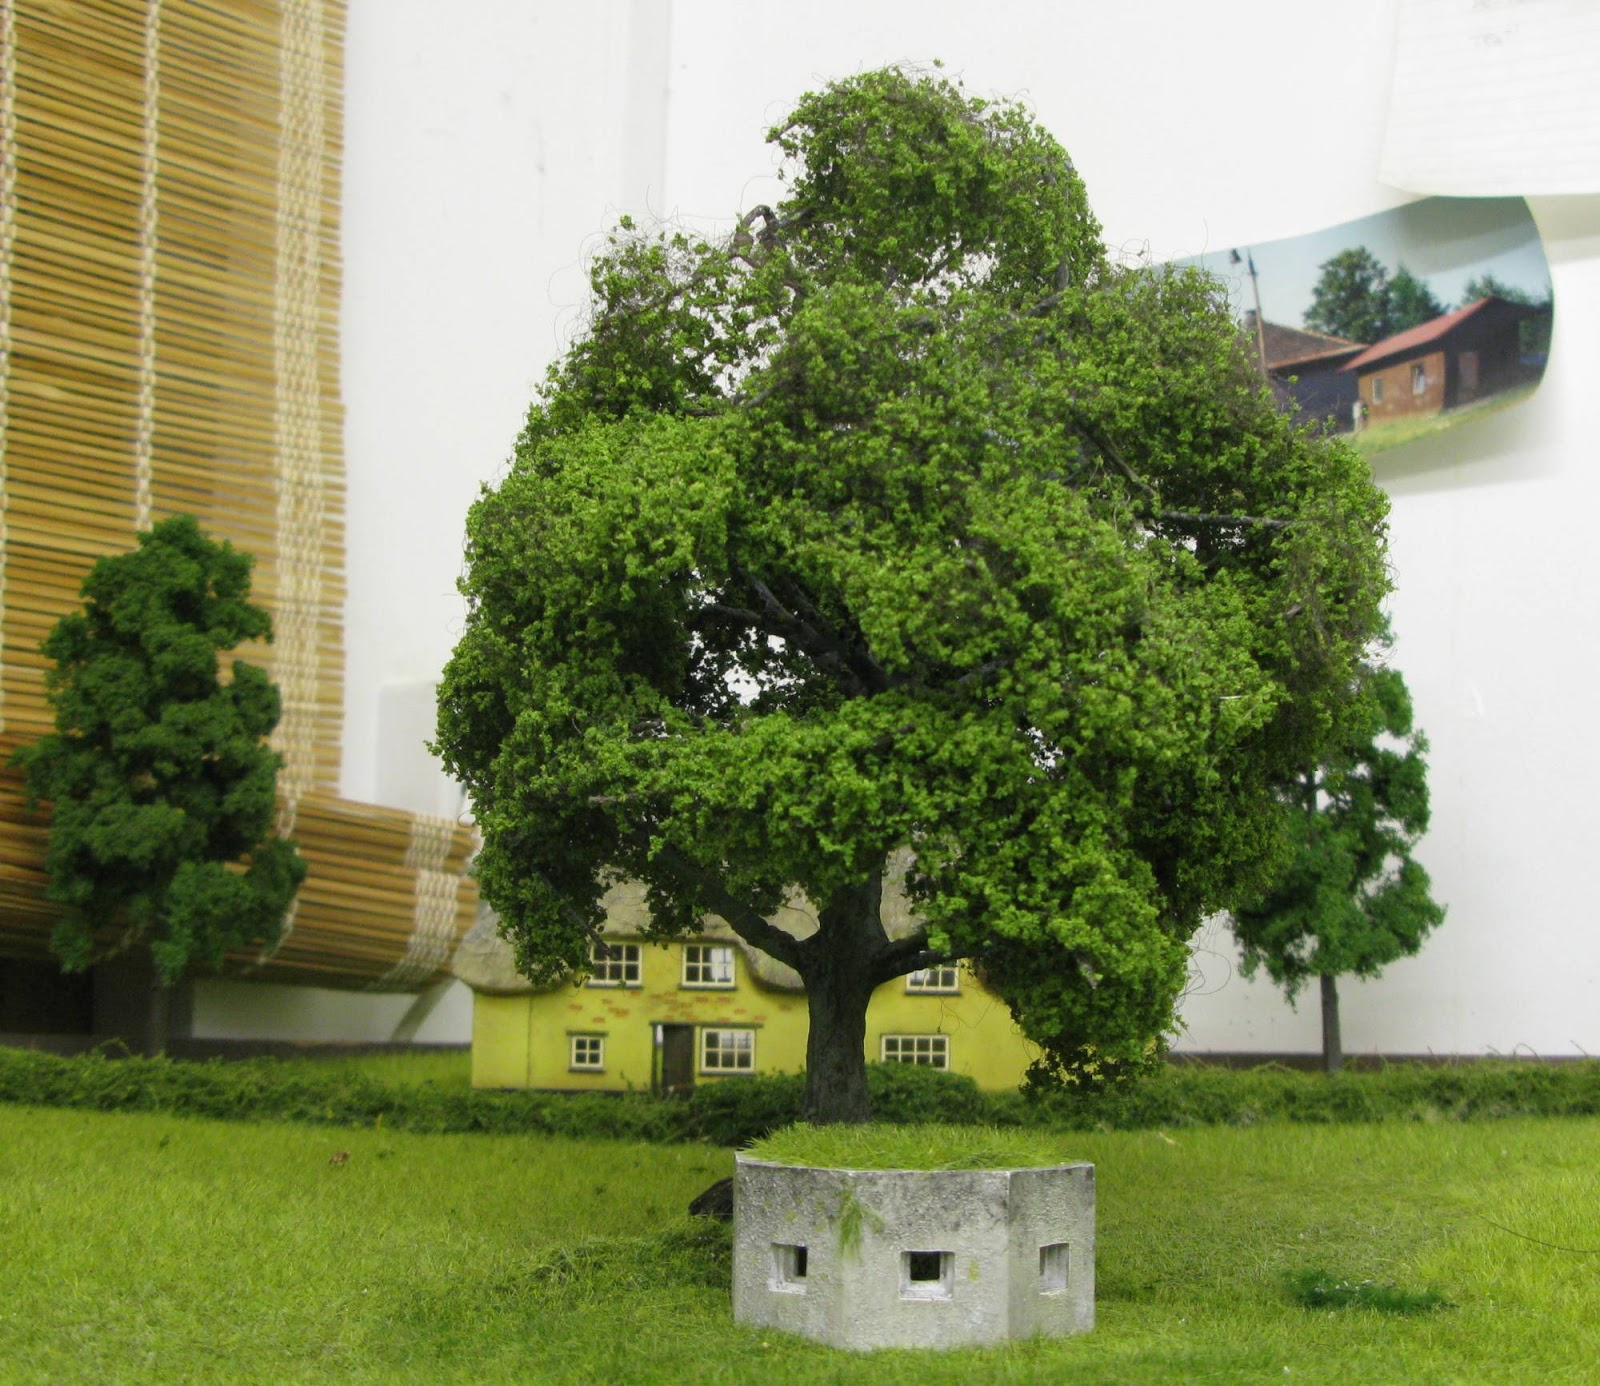 The_tree.jpg